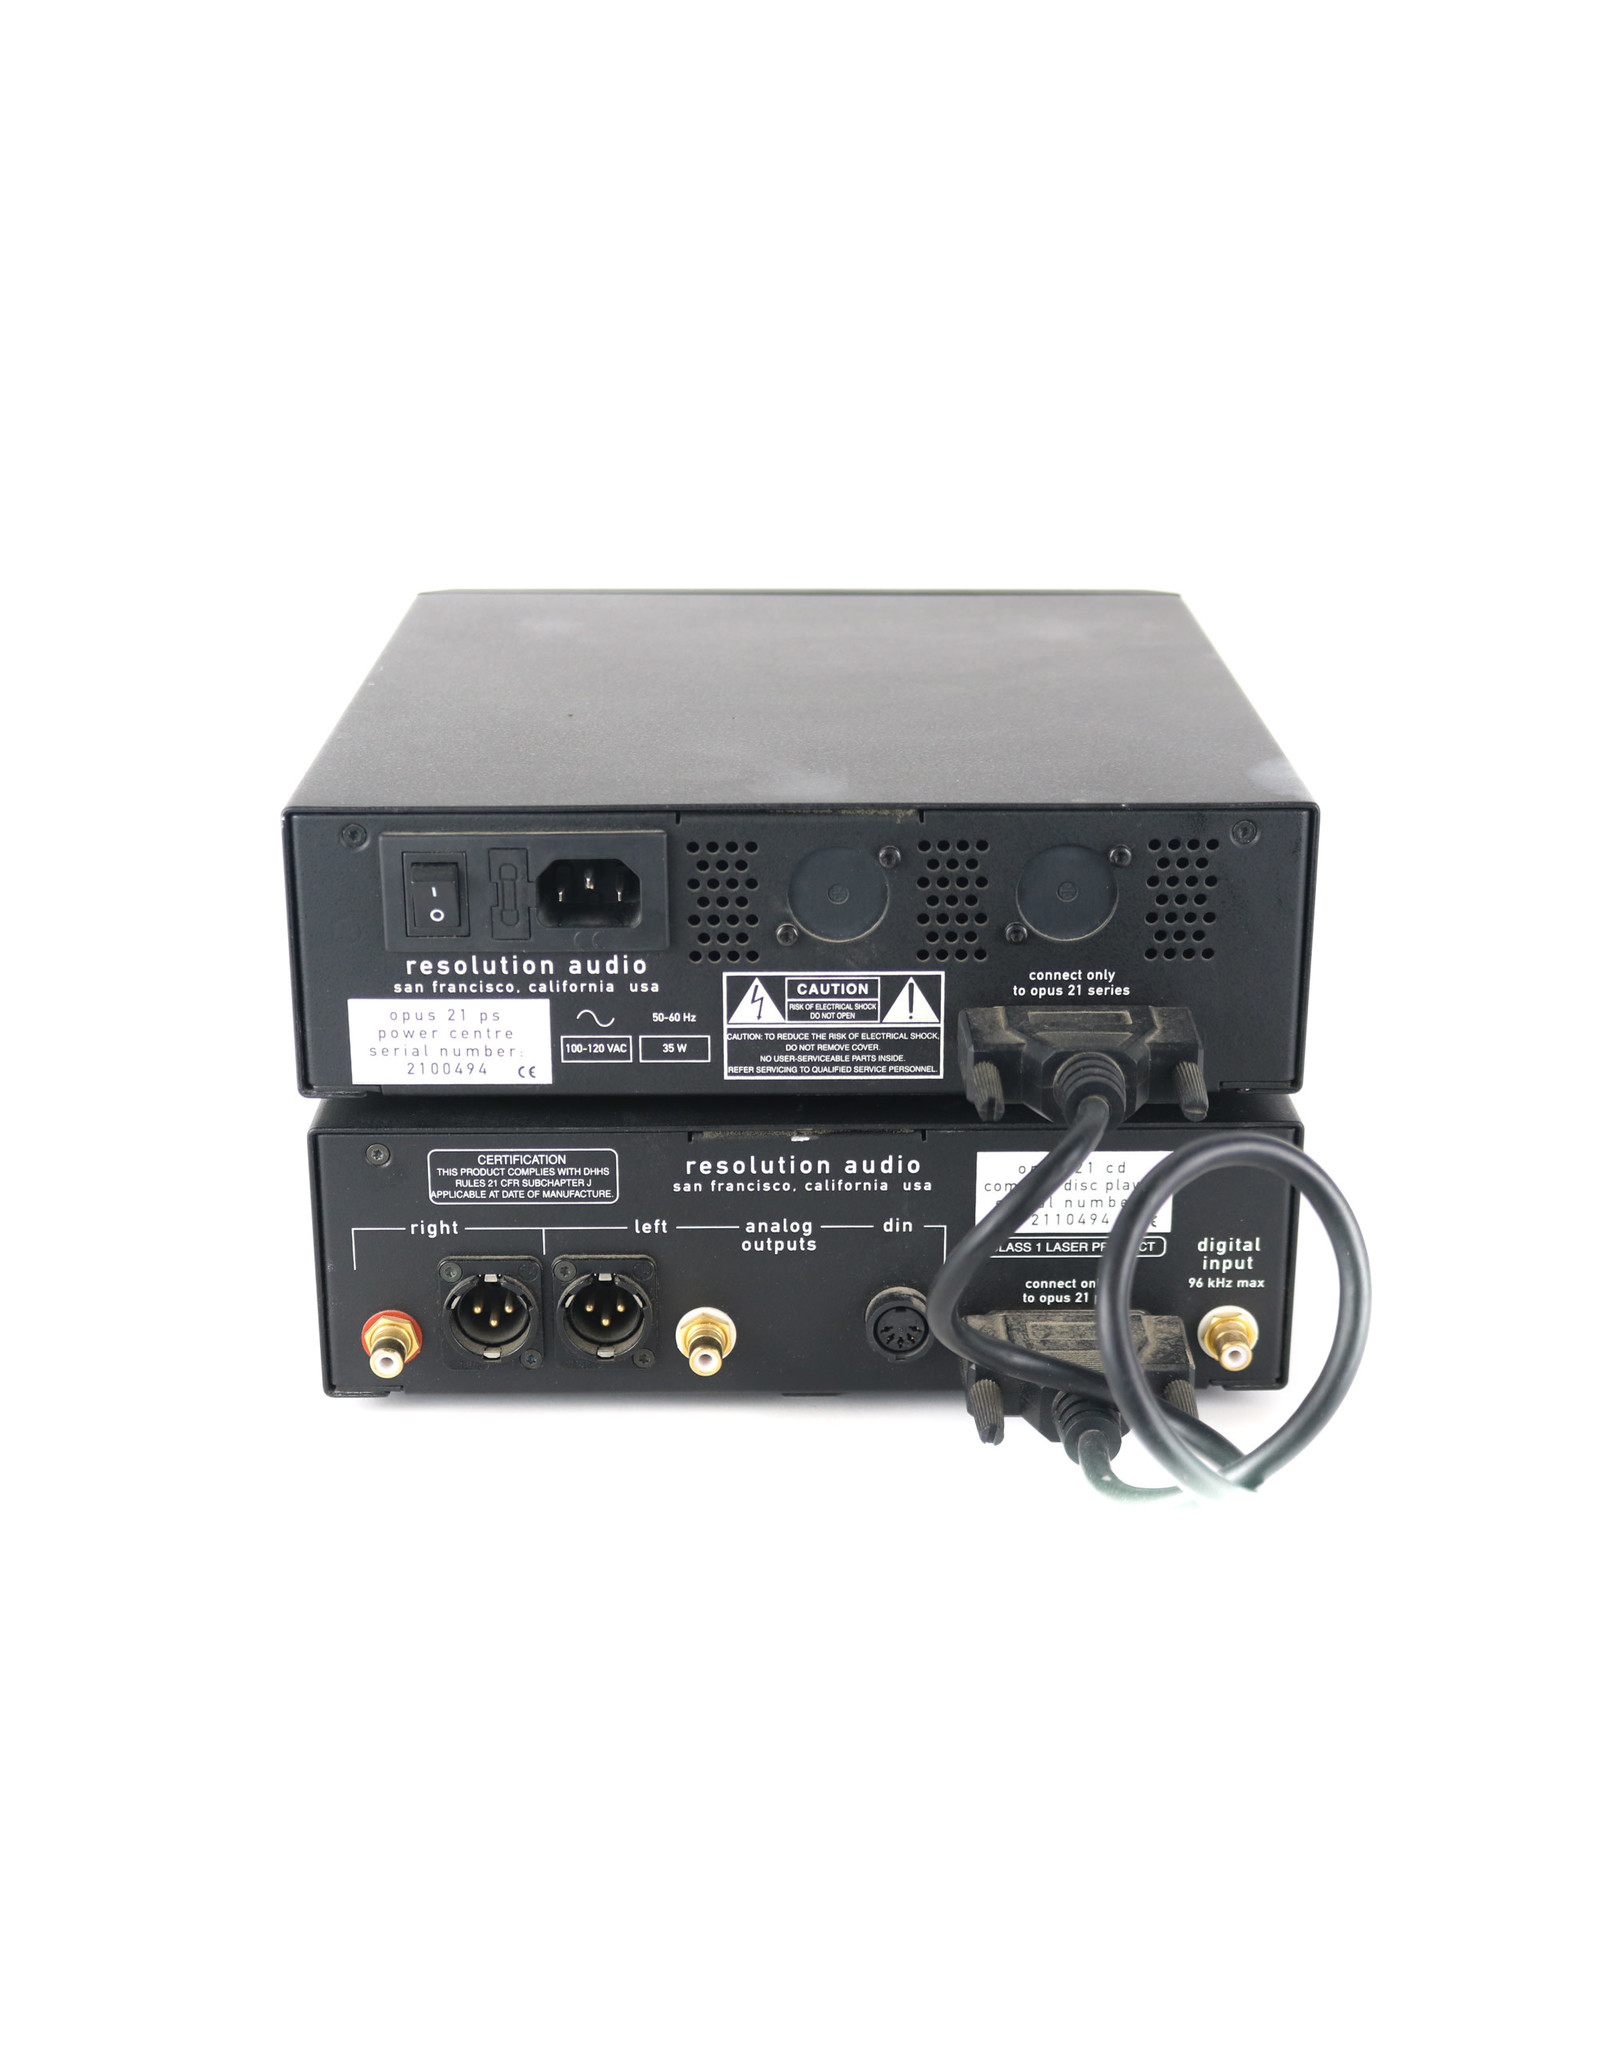 Resolution Audio Resolution Audio Opus 21 CD Player USED